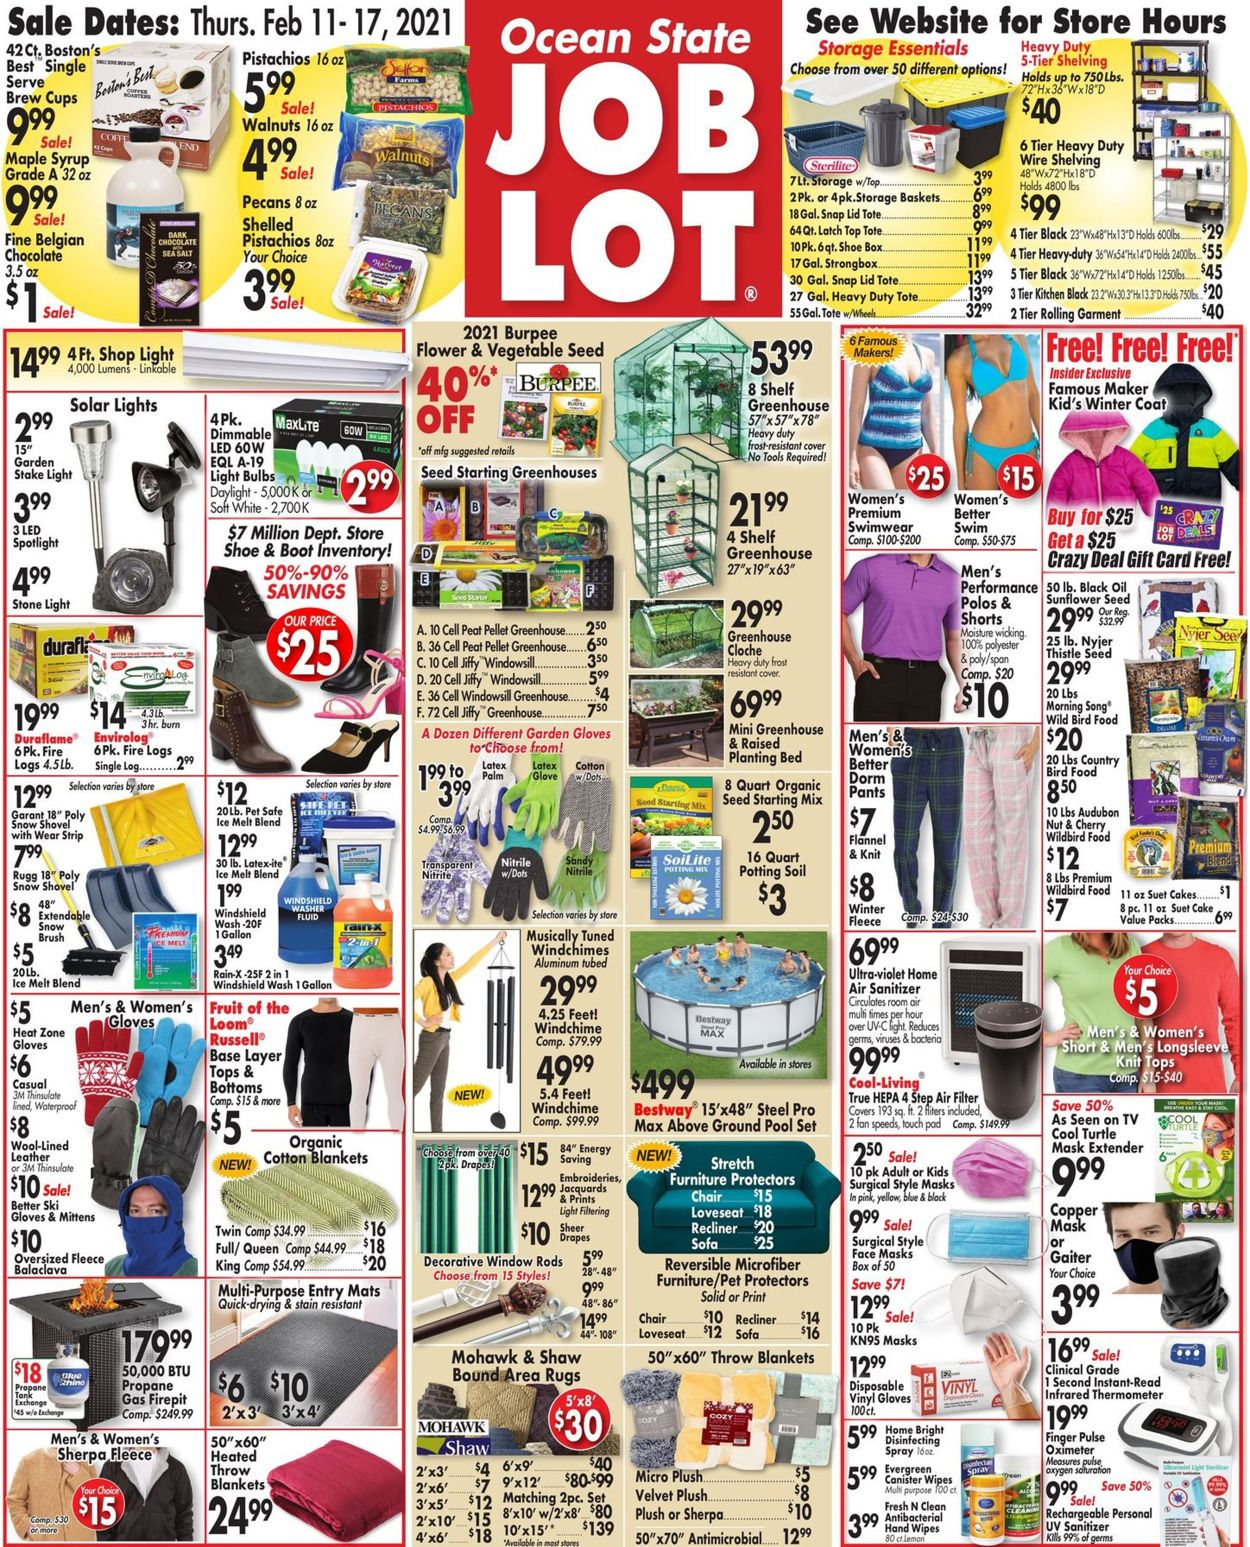 Ocean State Job Lot Weekly Ad Circular - valid 02/11-02/17/2021